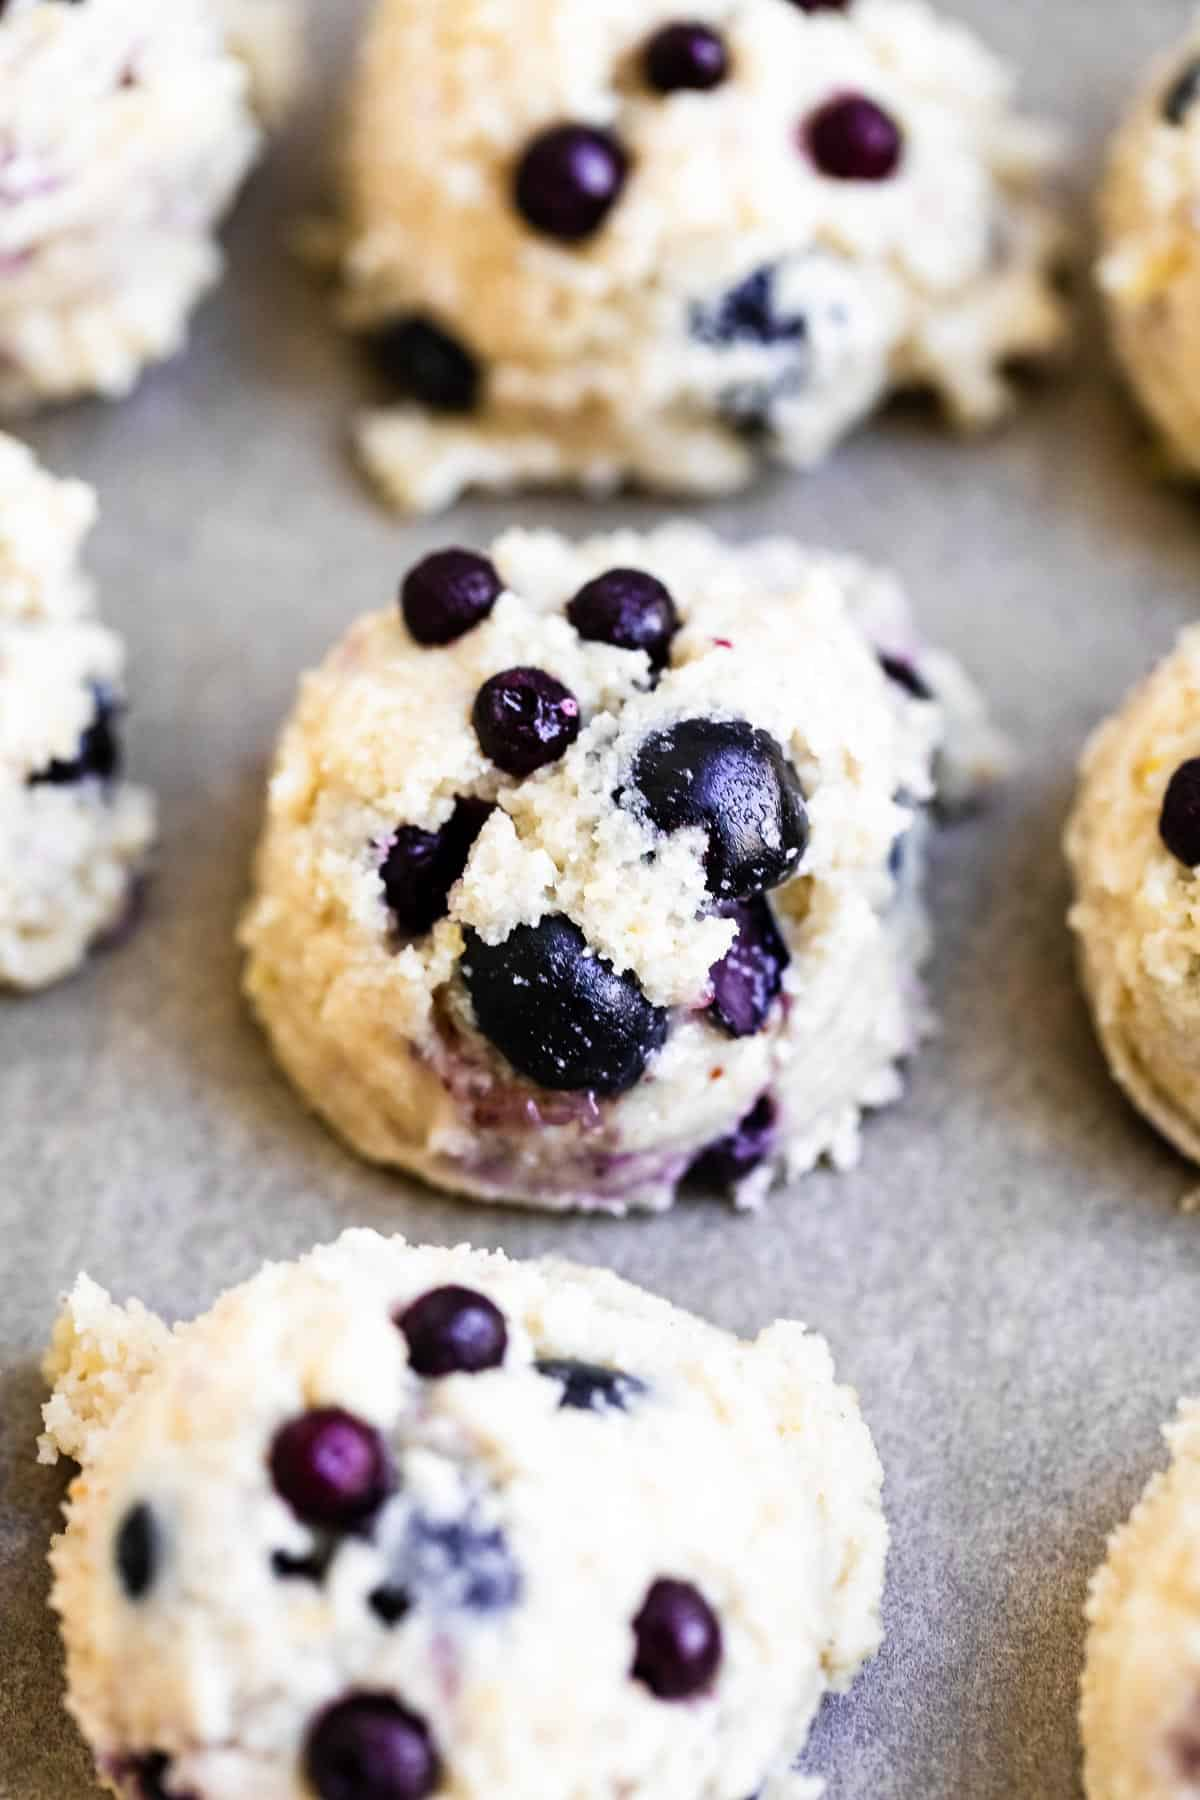 lemon cookie dough scooped into balls